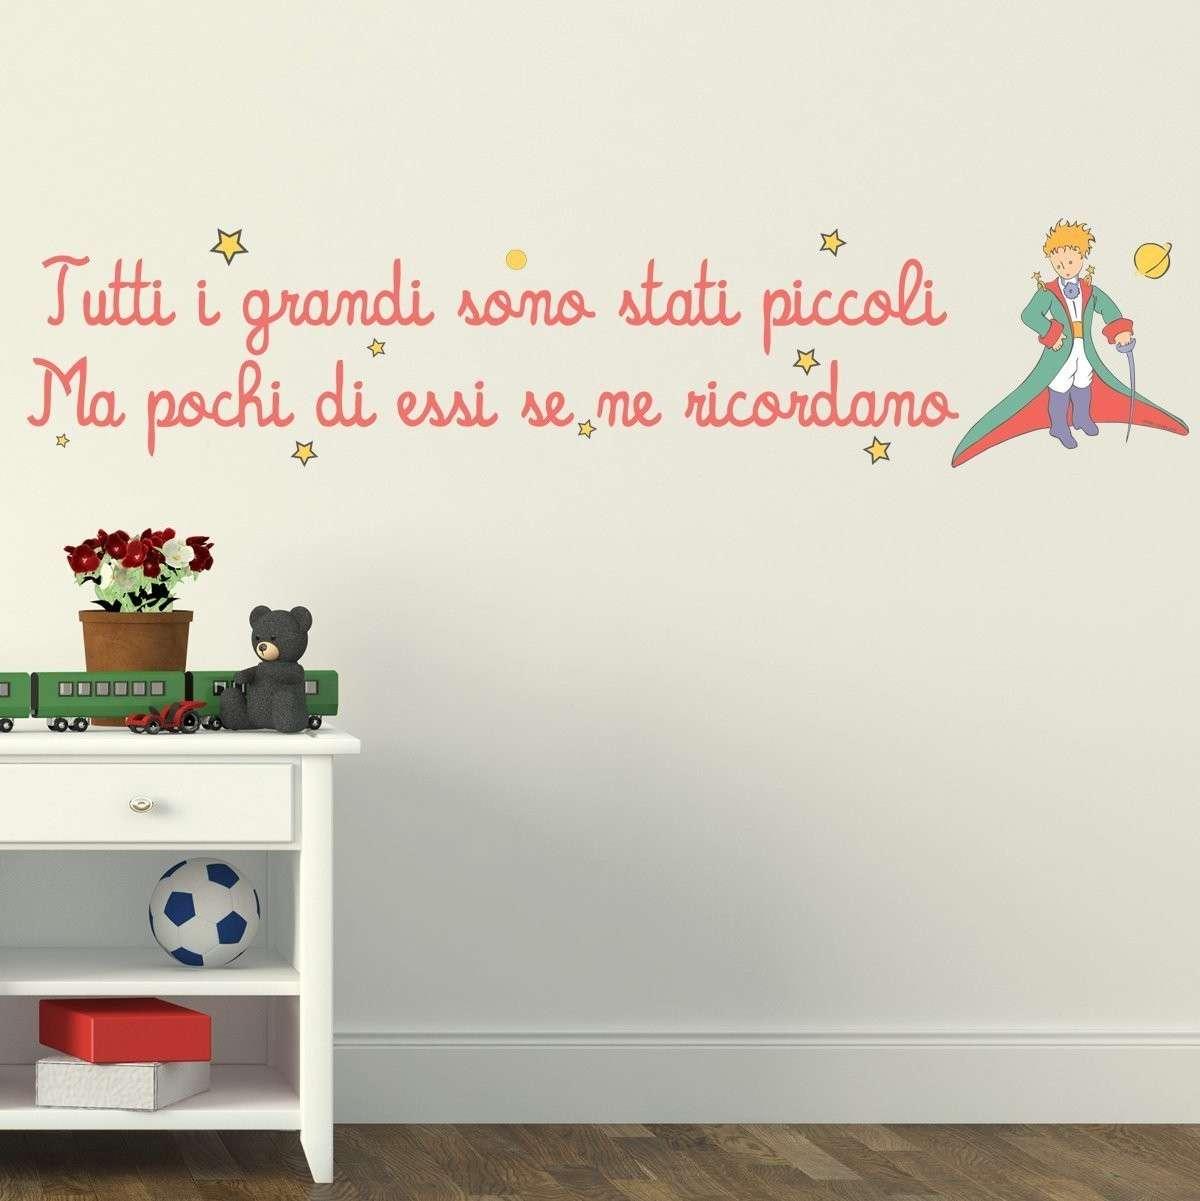 Frasi adesive per pareti le pi belle foto pourfemme for Bordure adesive per pareti